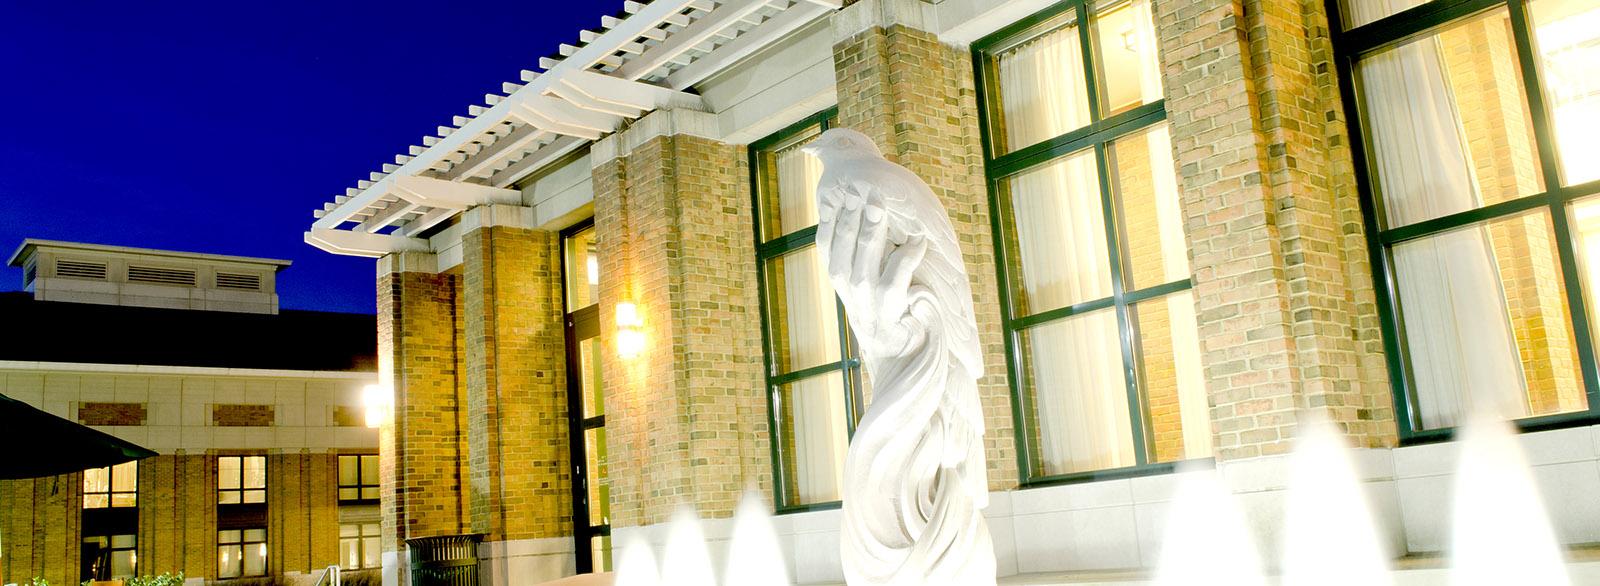 CRH sculpture at night